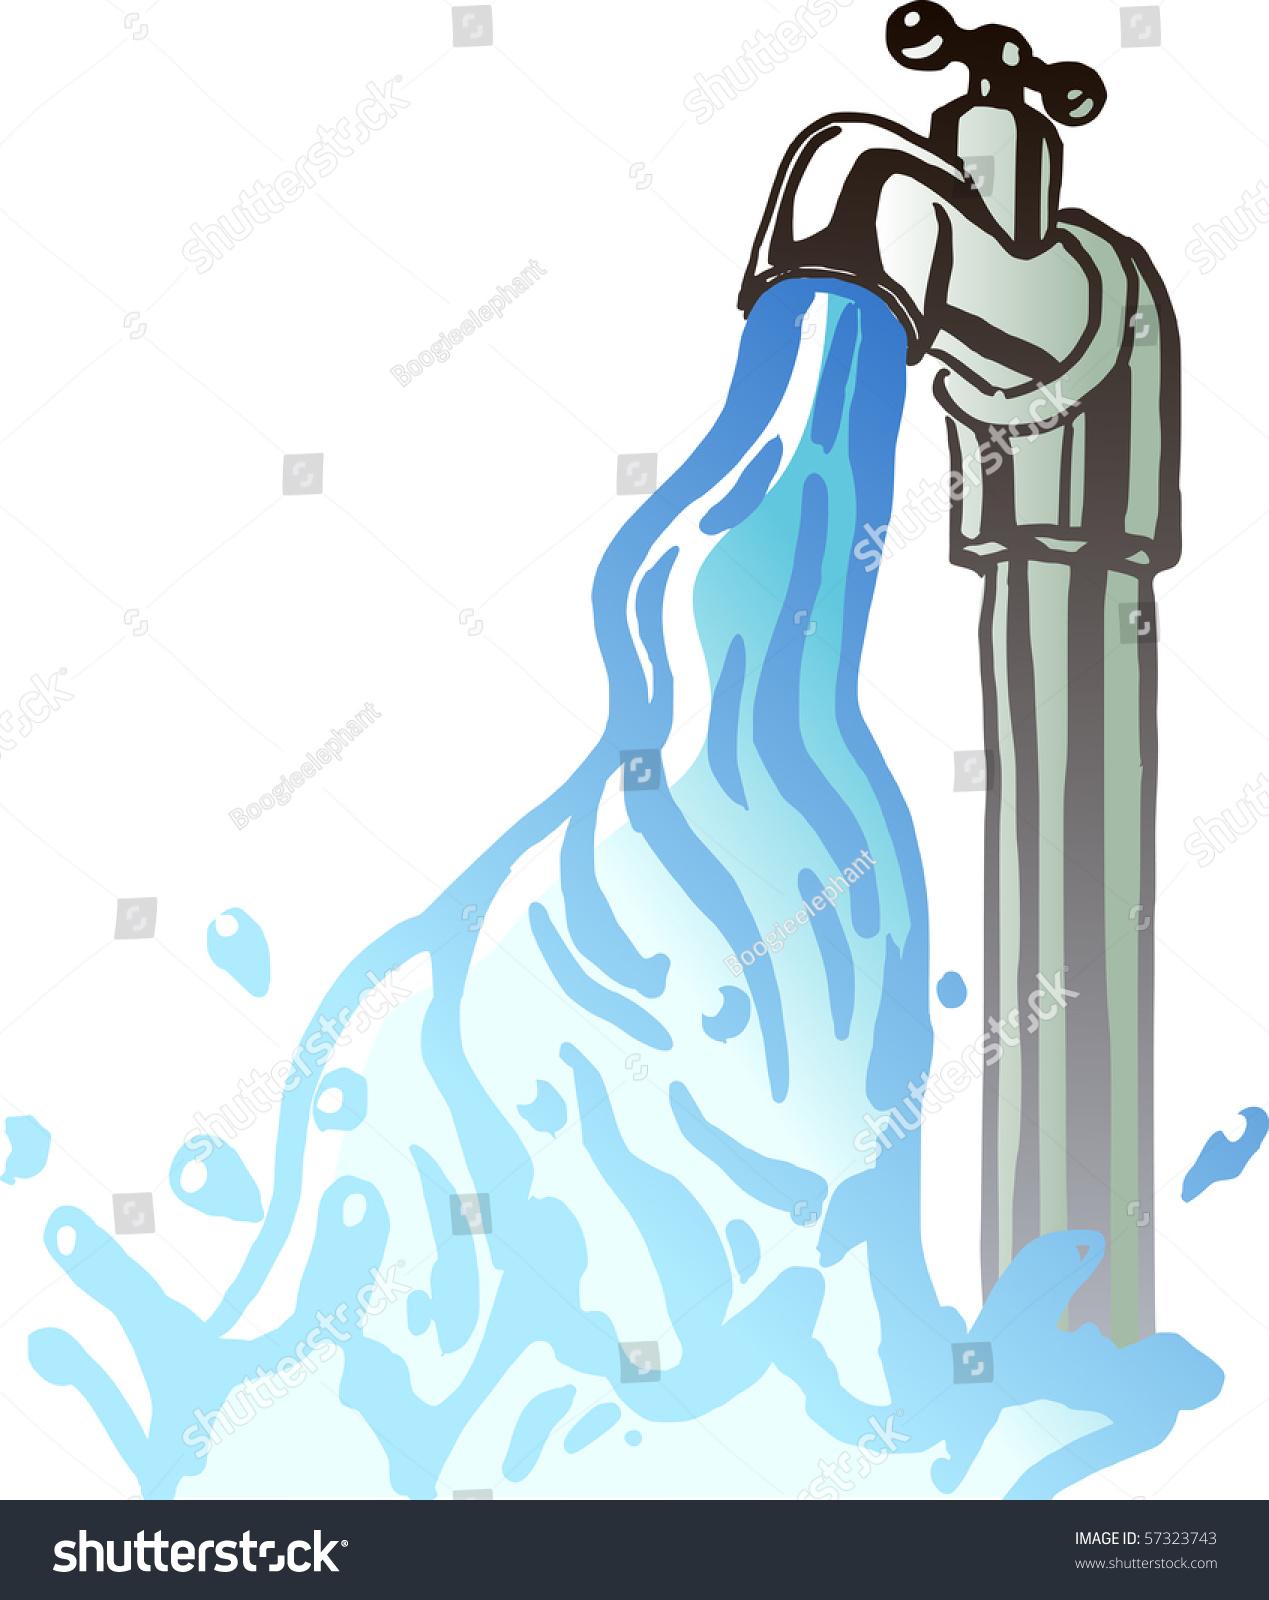 Running Water Faucet Stock Vector 57323743 - Shutterstock